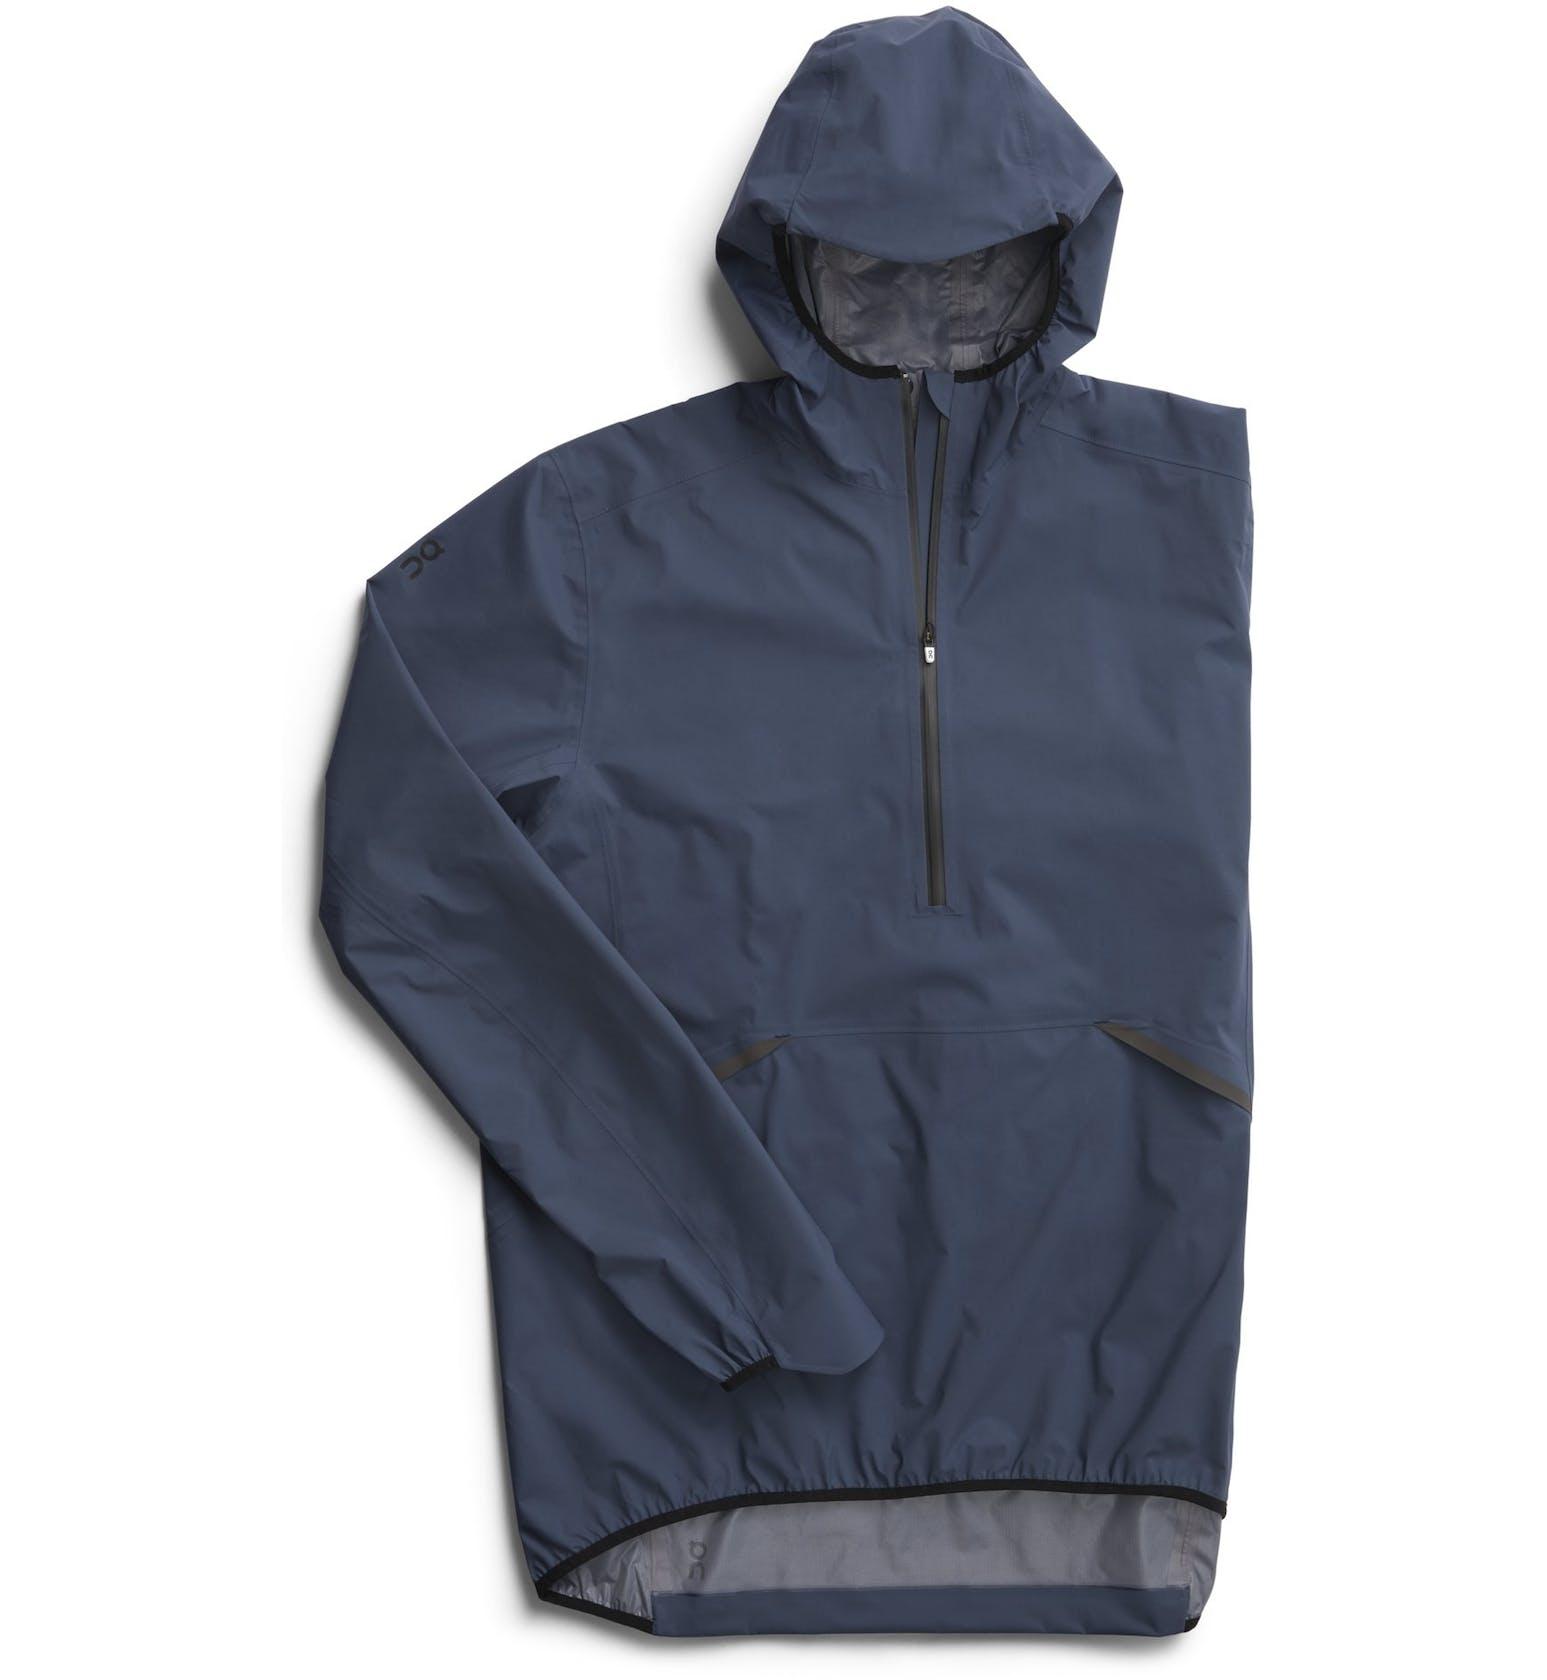 On Waterproof Anorak - giacca antipioggia - uomo